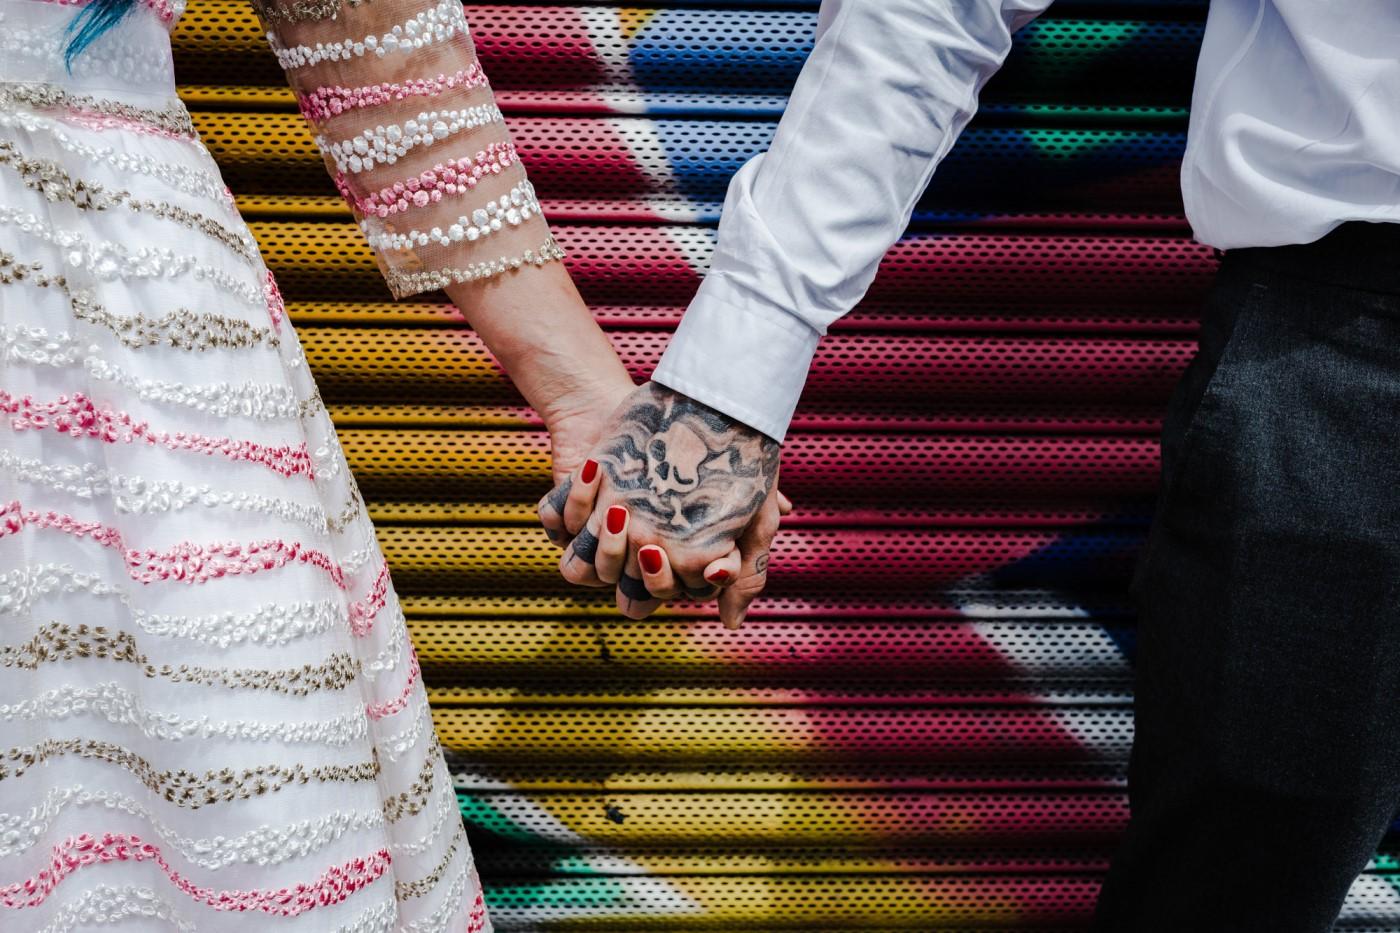 Last Minute Wedding- Kirsty Rocket Photography- Urban Wedding- Wedding Ideas- Wedding Planning- Alternative Wedding- Unconventional Wedding- Creative Wedding- Unique Wedding Dress- Alternative Couple- Nottingham Wedding